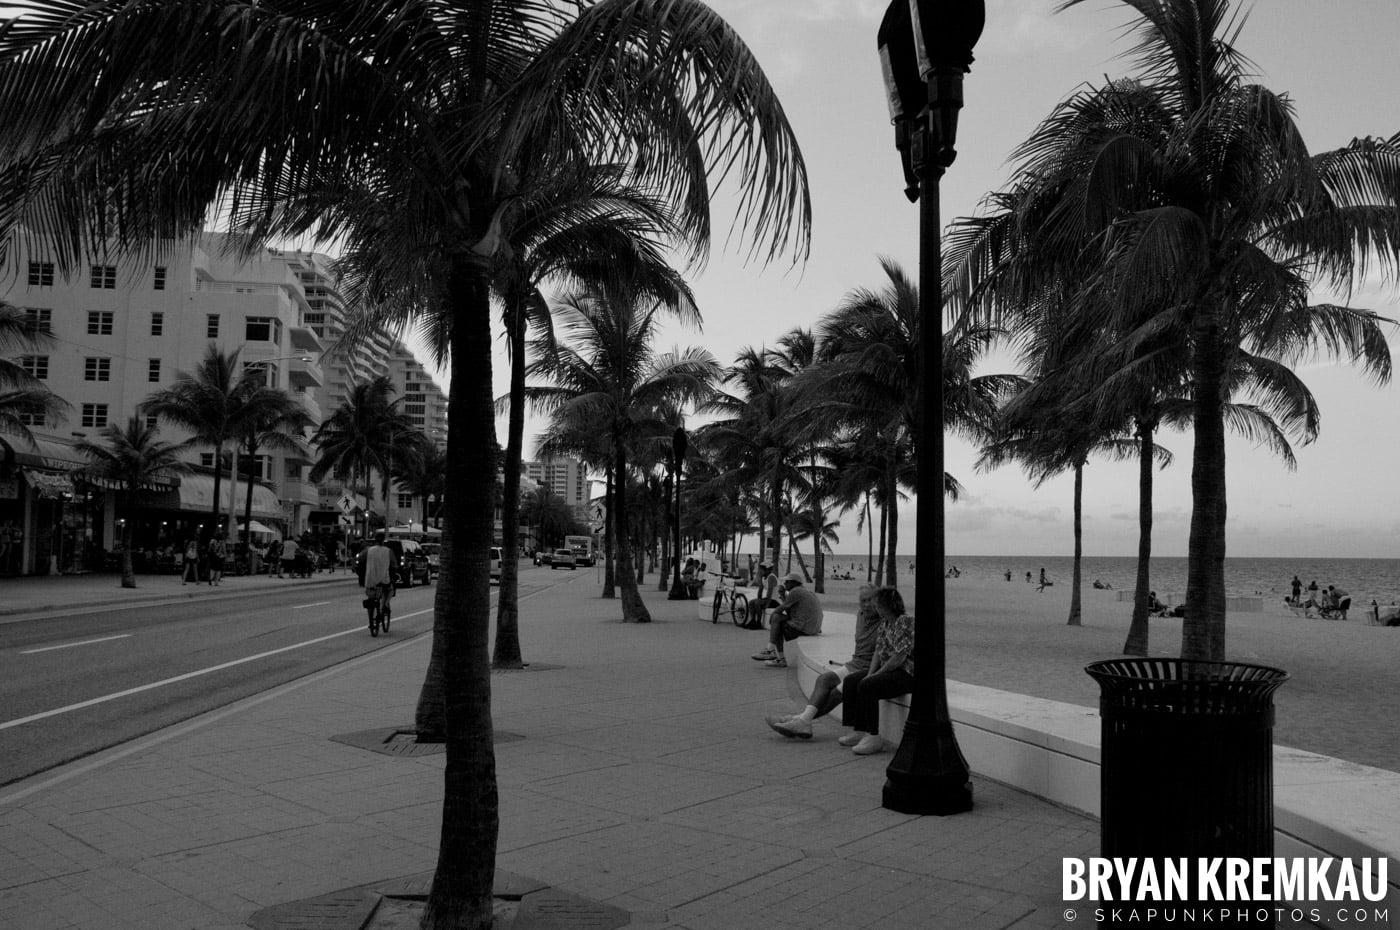 Florida Keys Vacation - 7.09.10 - 7.15.10 (96)